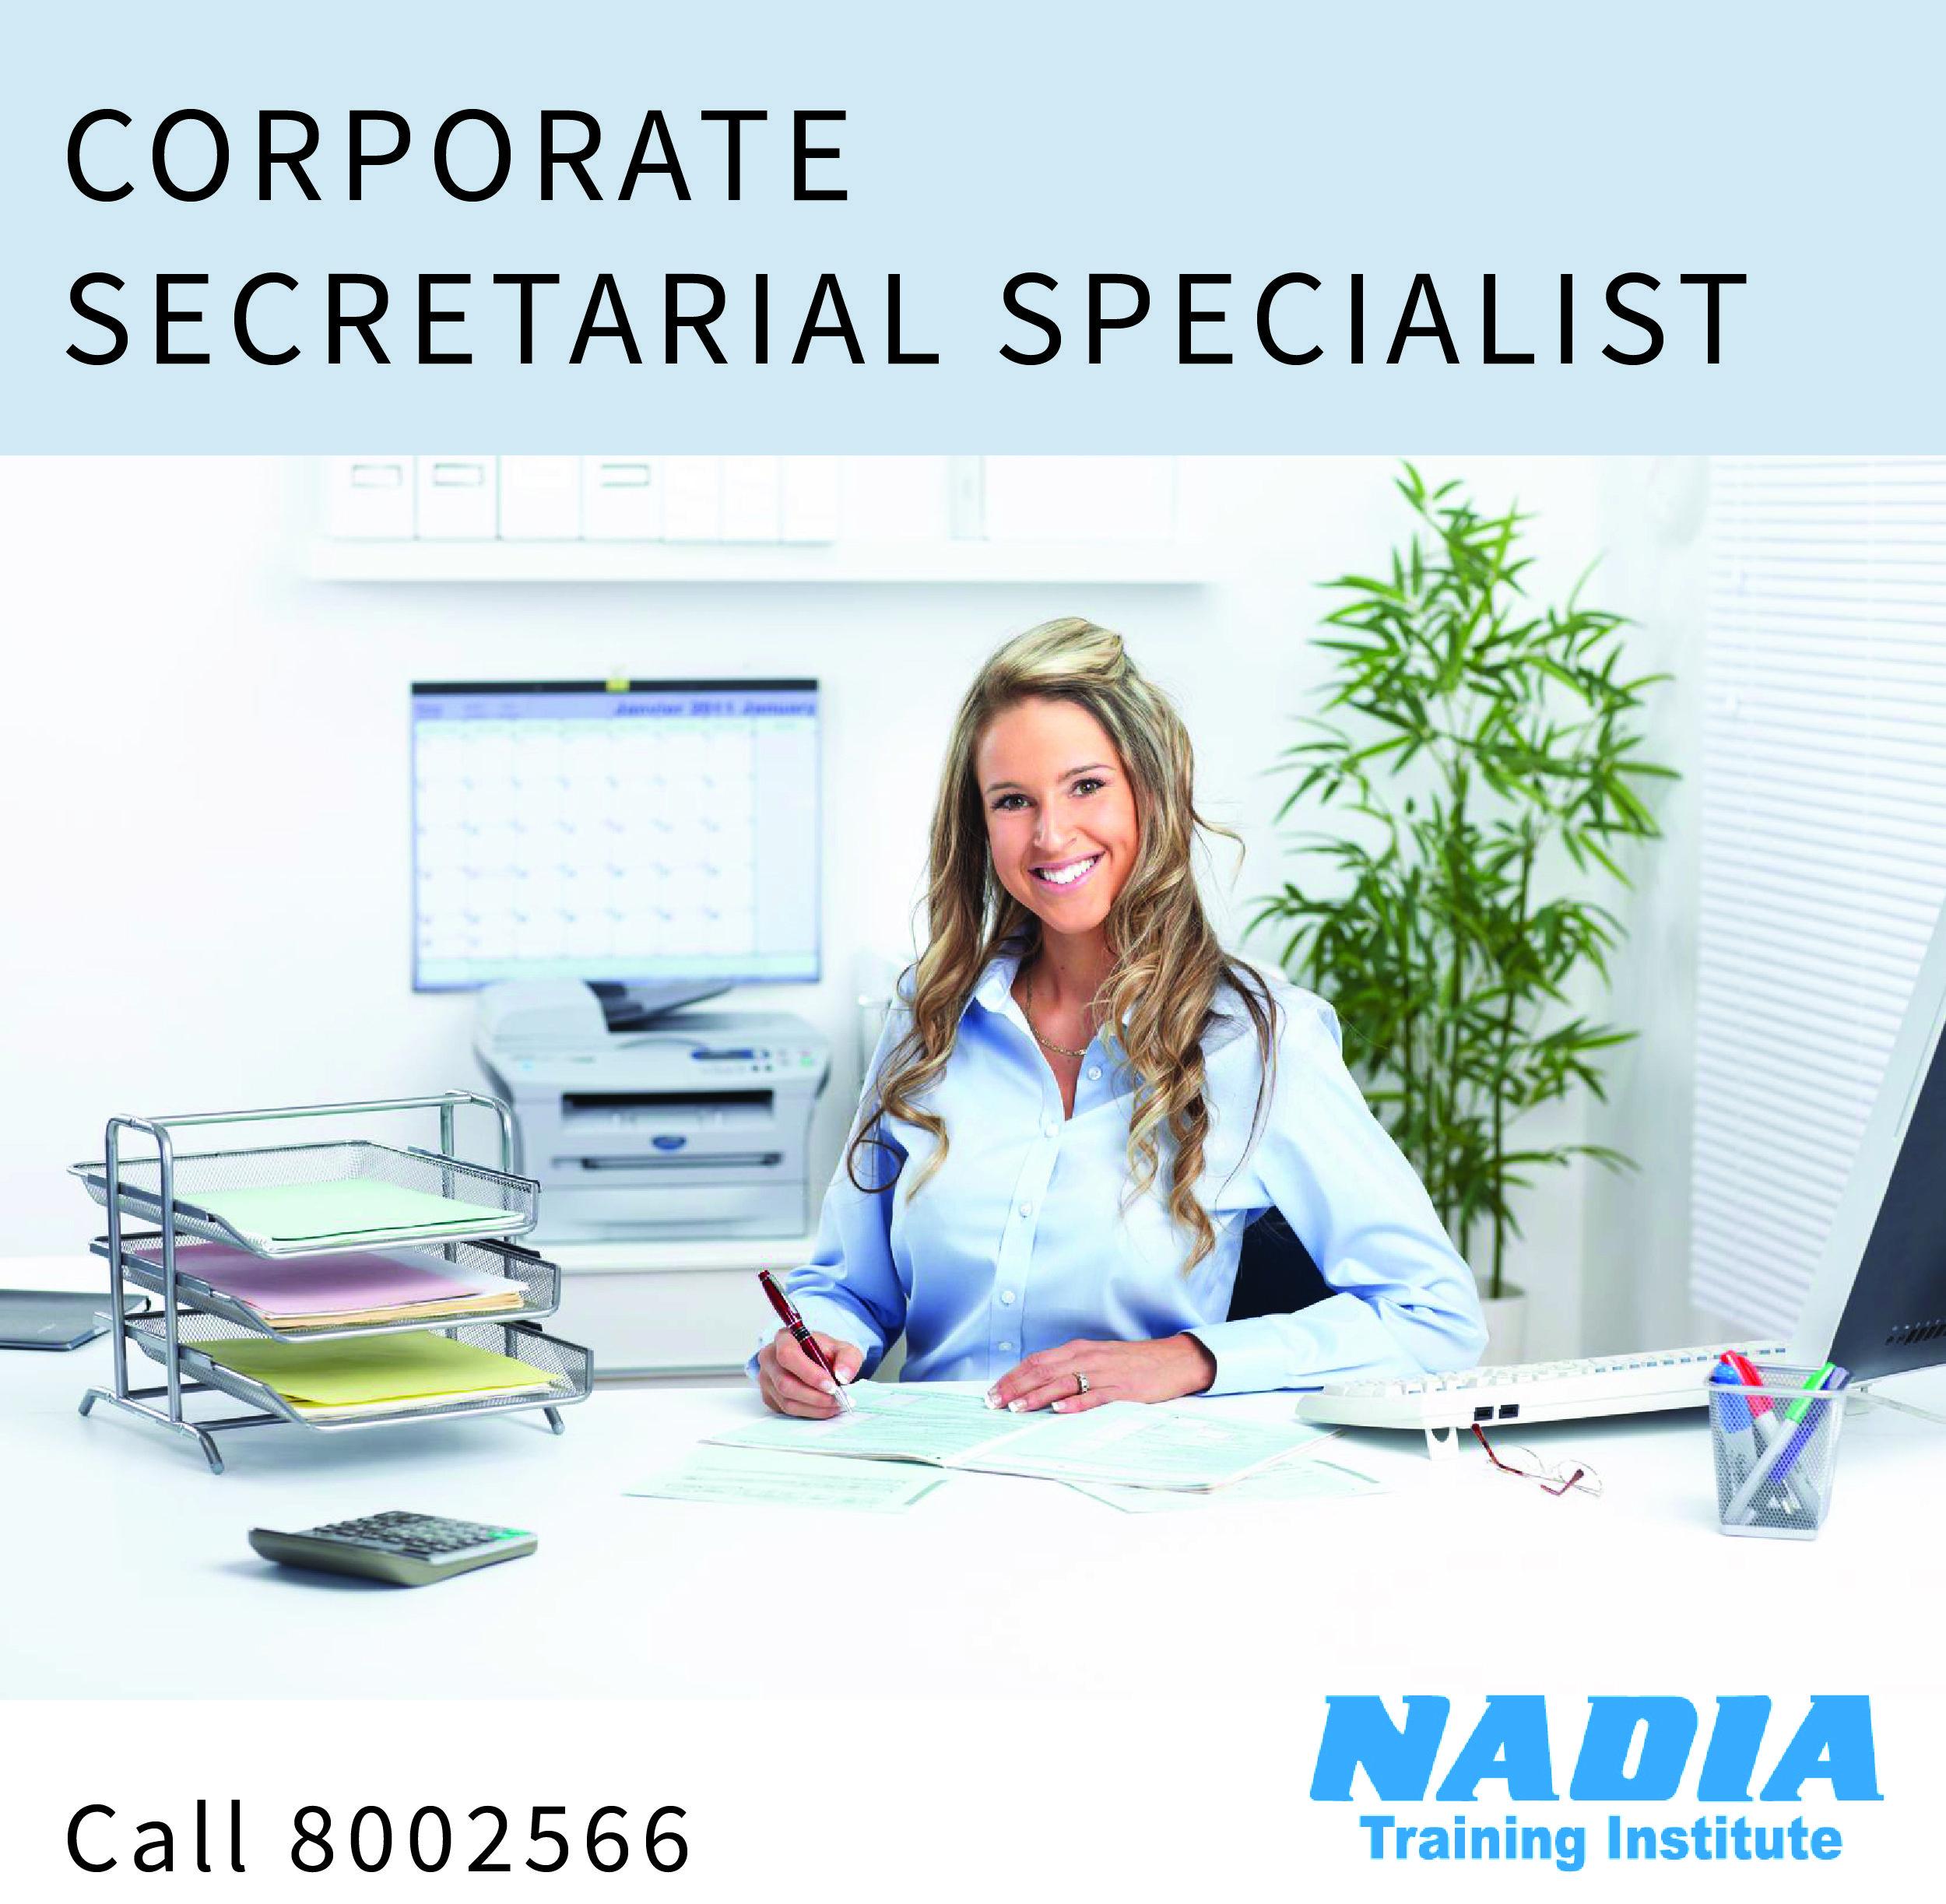 Corporate Secretarial Course in Dubai, Abu Dhabi and